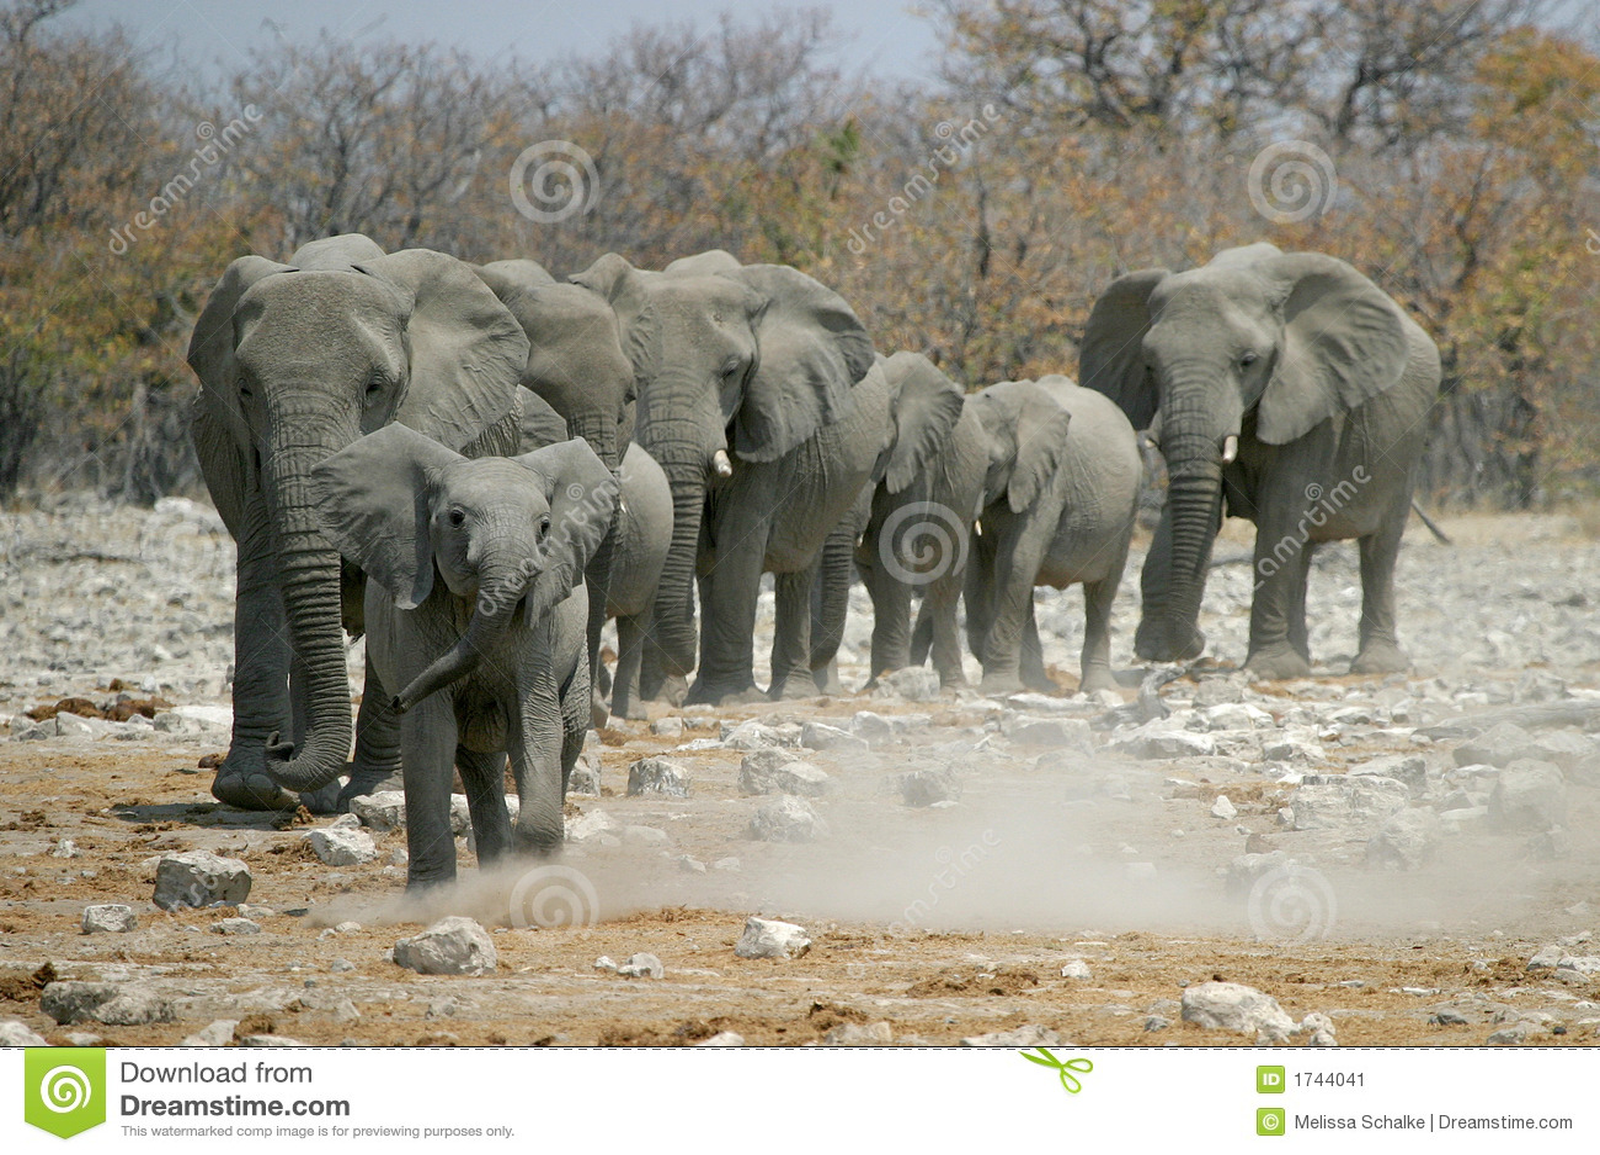 Kleine Elefanten, Welche Die Herde Führen Stockbild - Bild: 1744041 | {Herde 35}